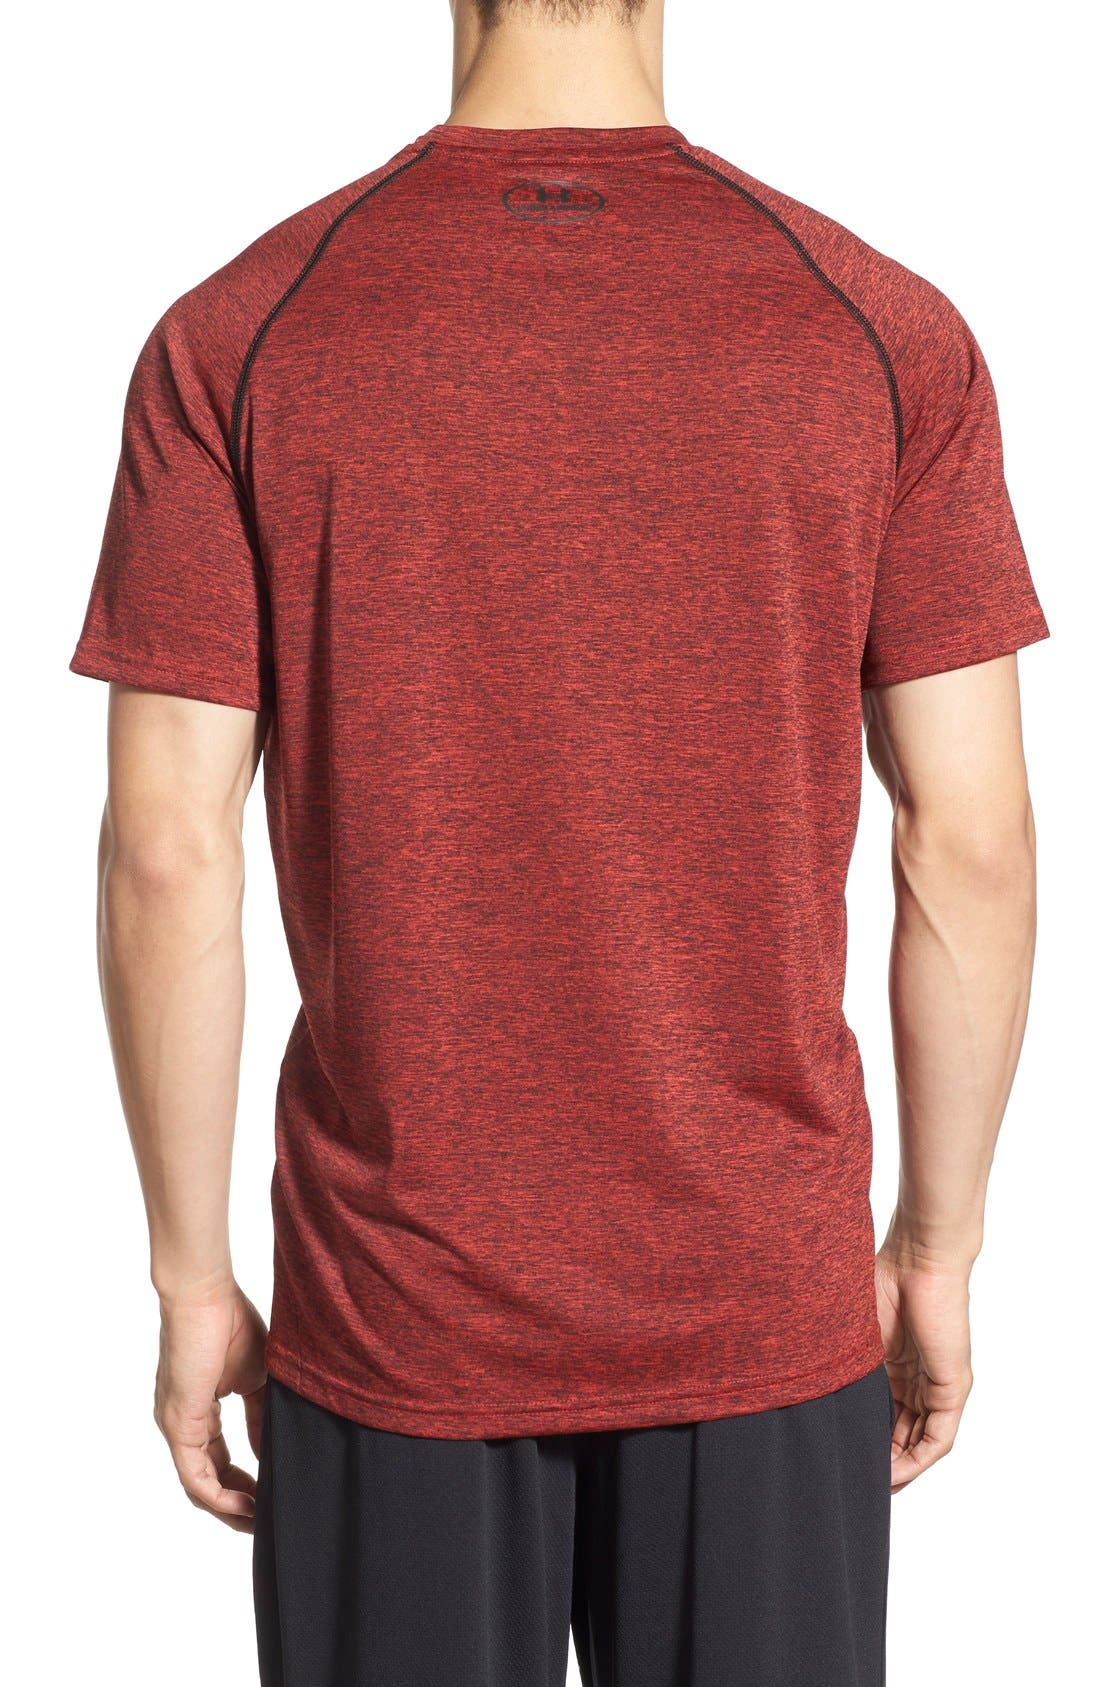 Alternate Image 2  - Under Armour 'UA Tech' Loose Fit Short Sleeve T-Shirt